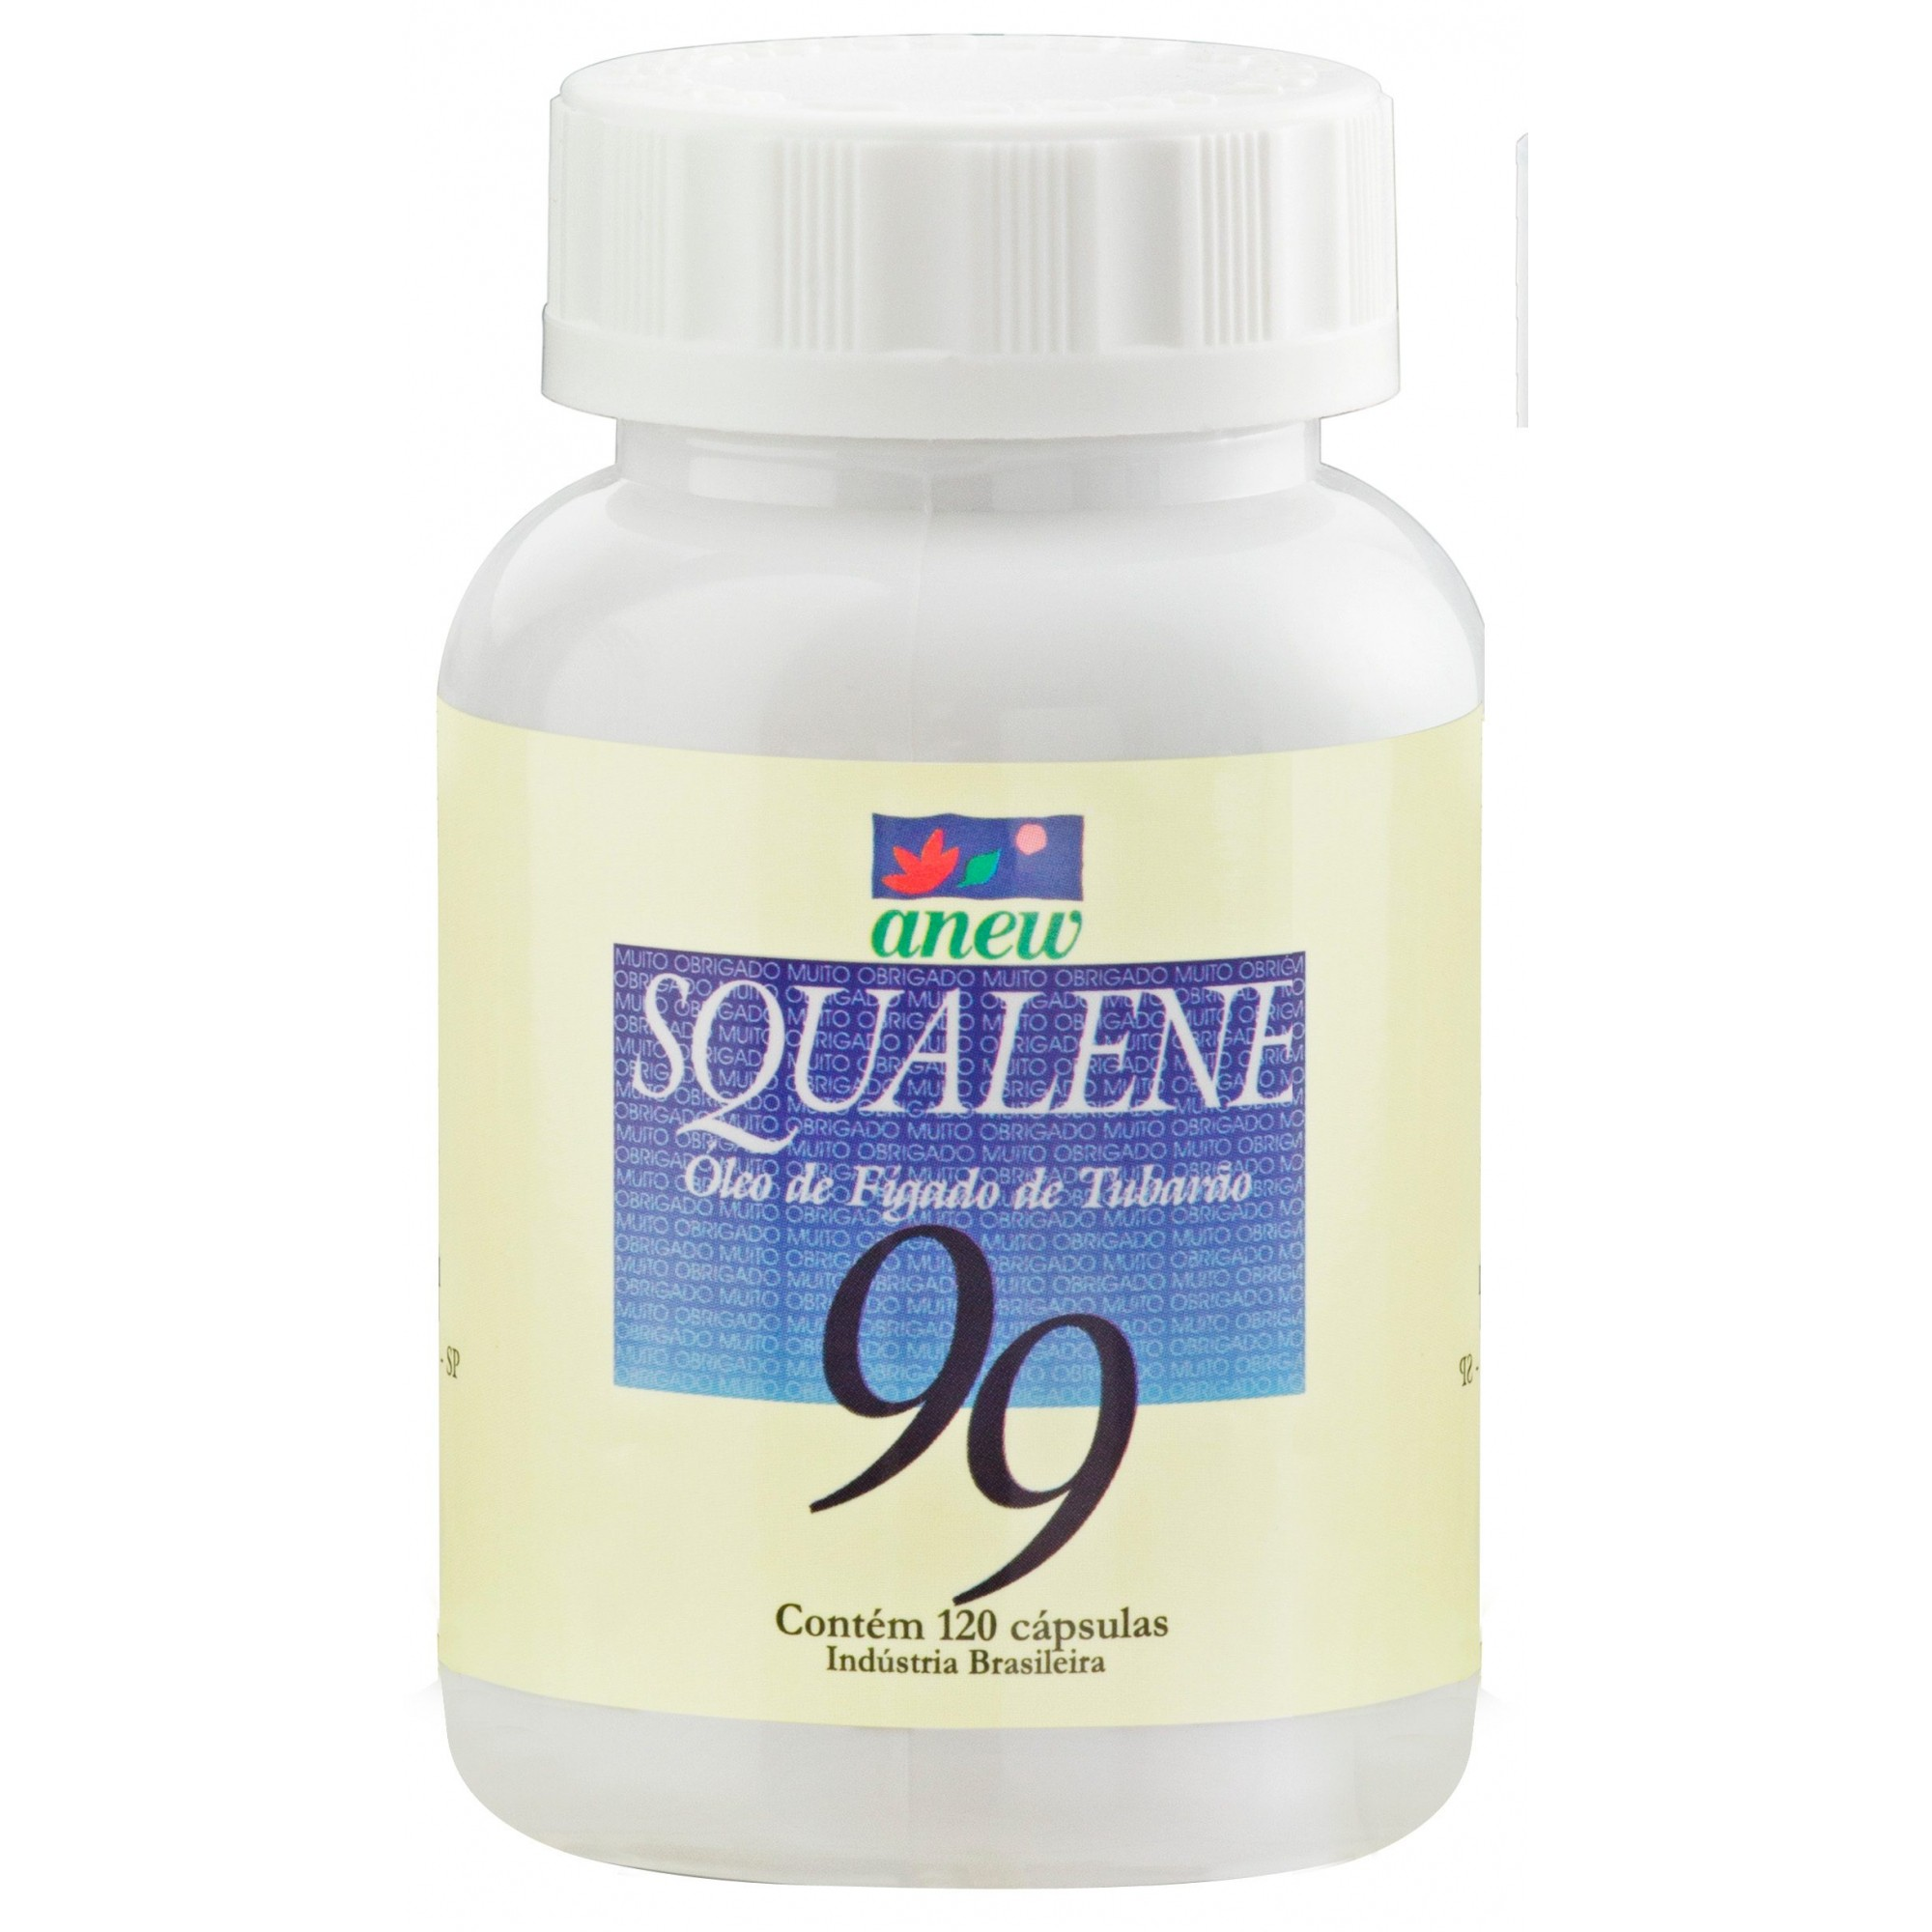 Squalene 99 Anew 120 cáps